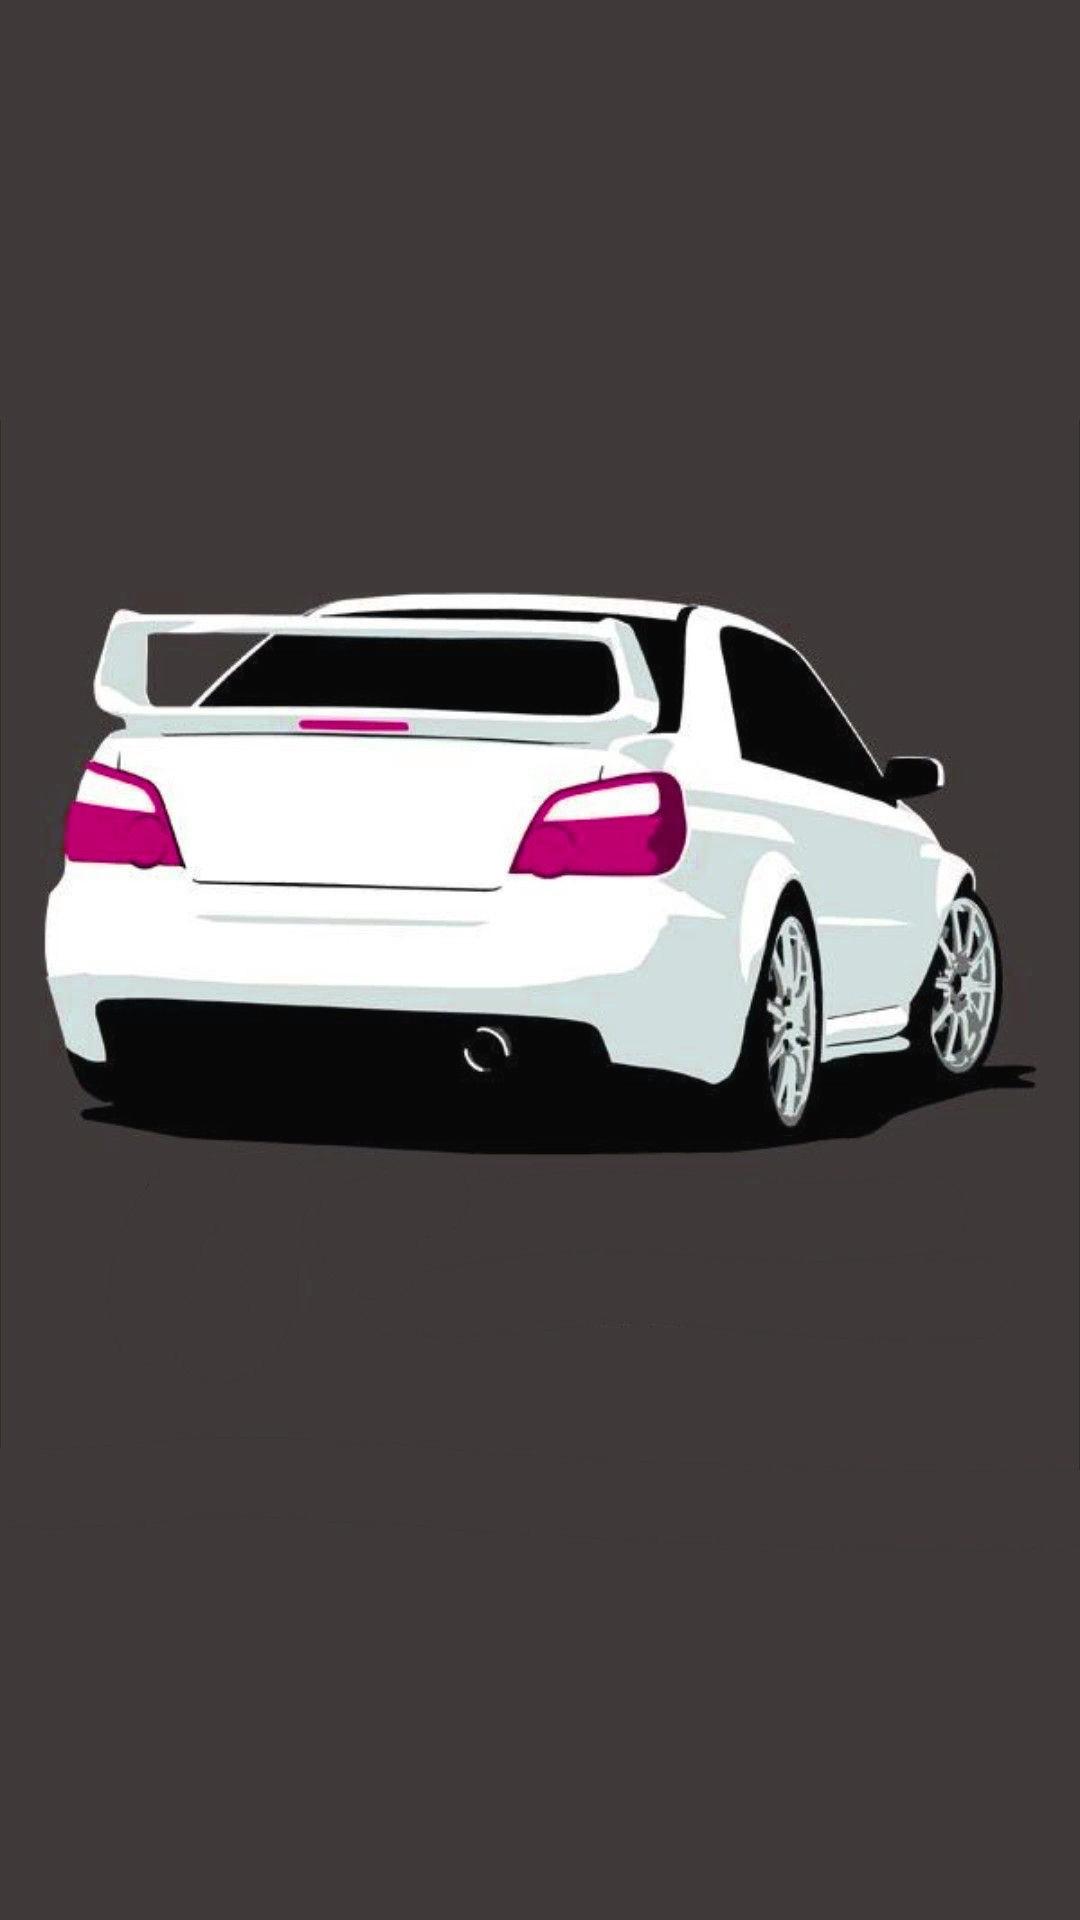 Jdm Car Wallpaper Kolpaper Awesome Free Hd Wallpapers